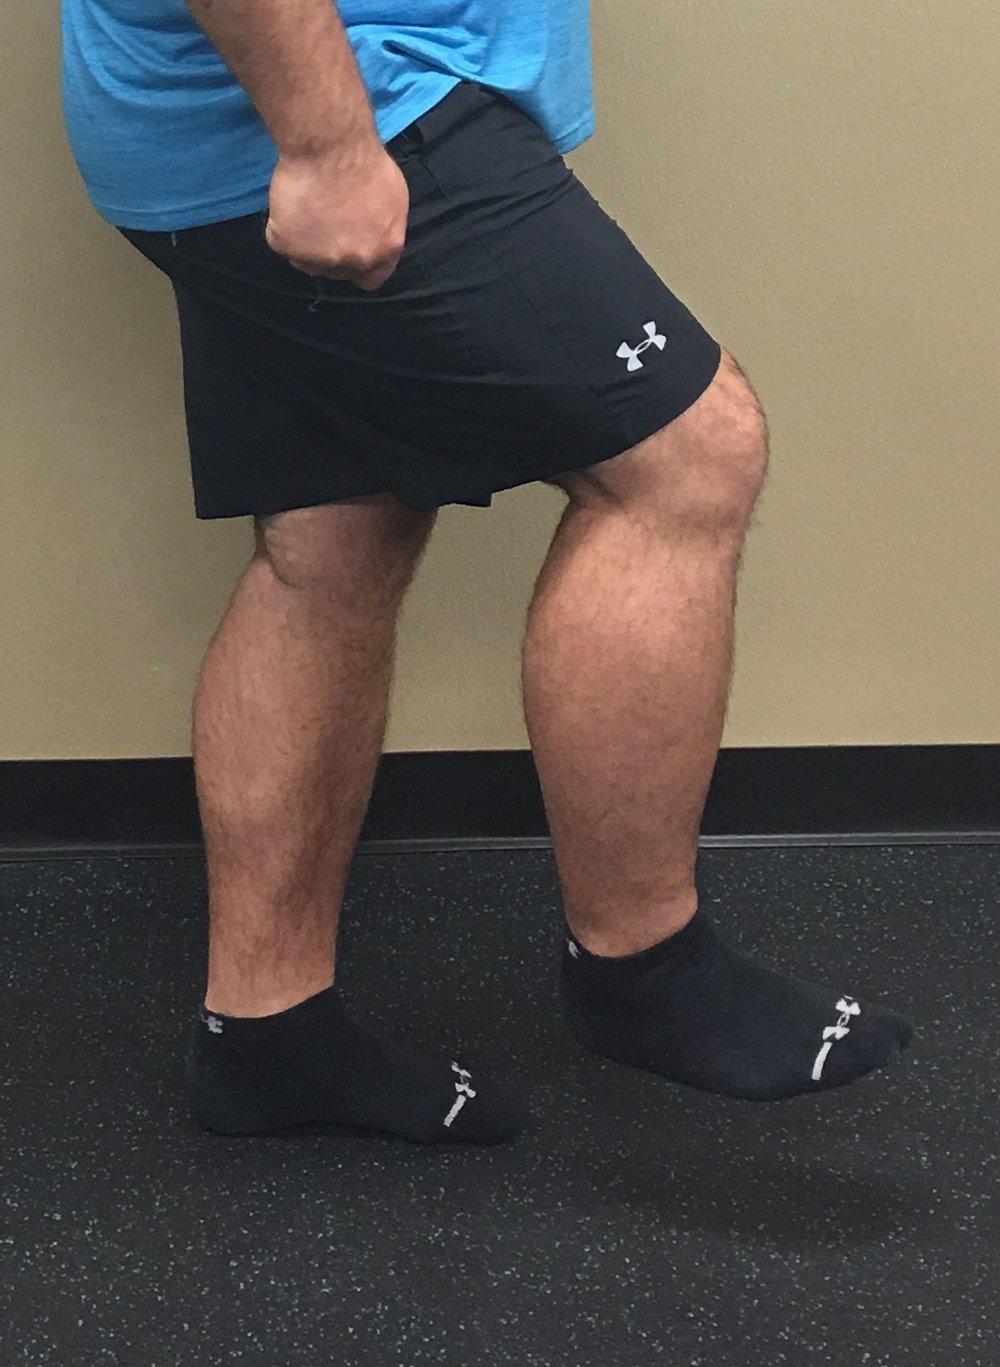 single leg 1.jpg